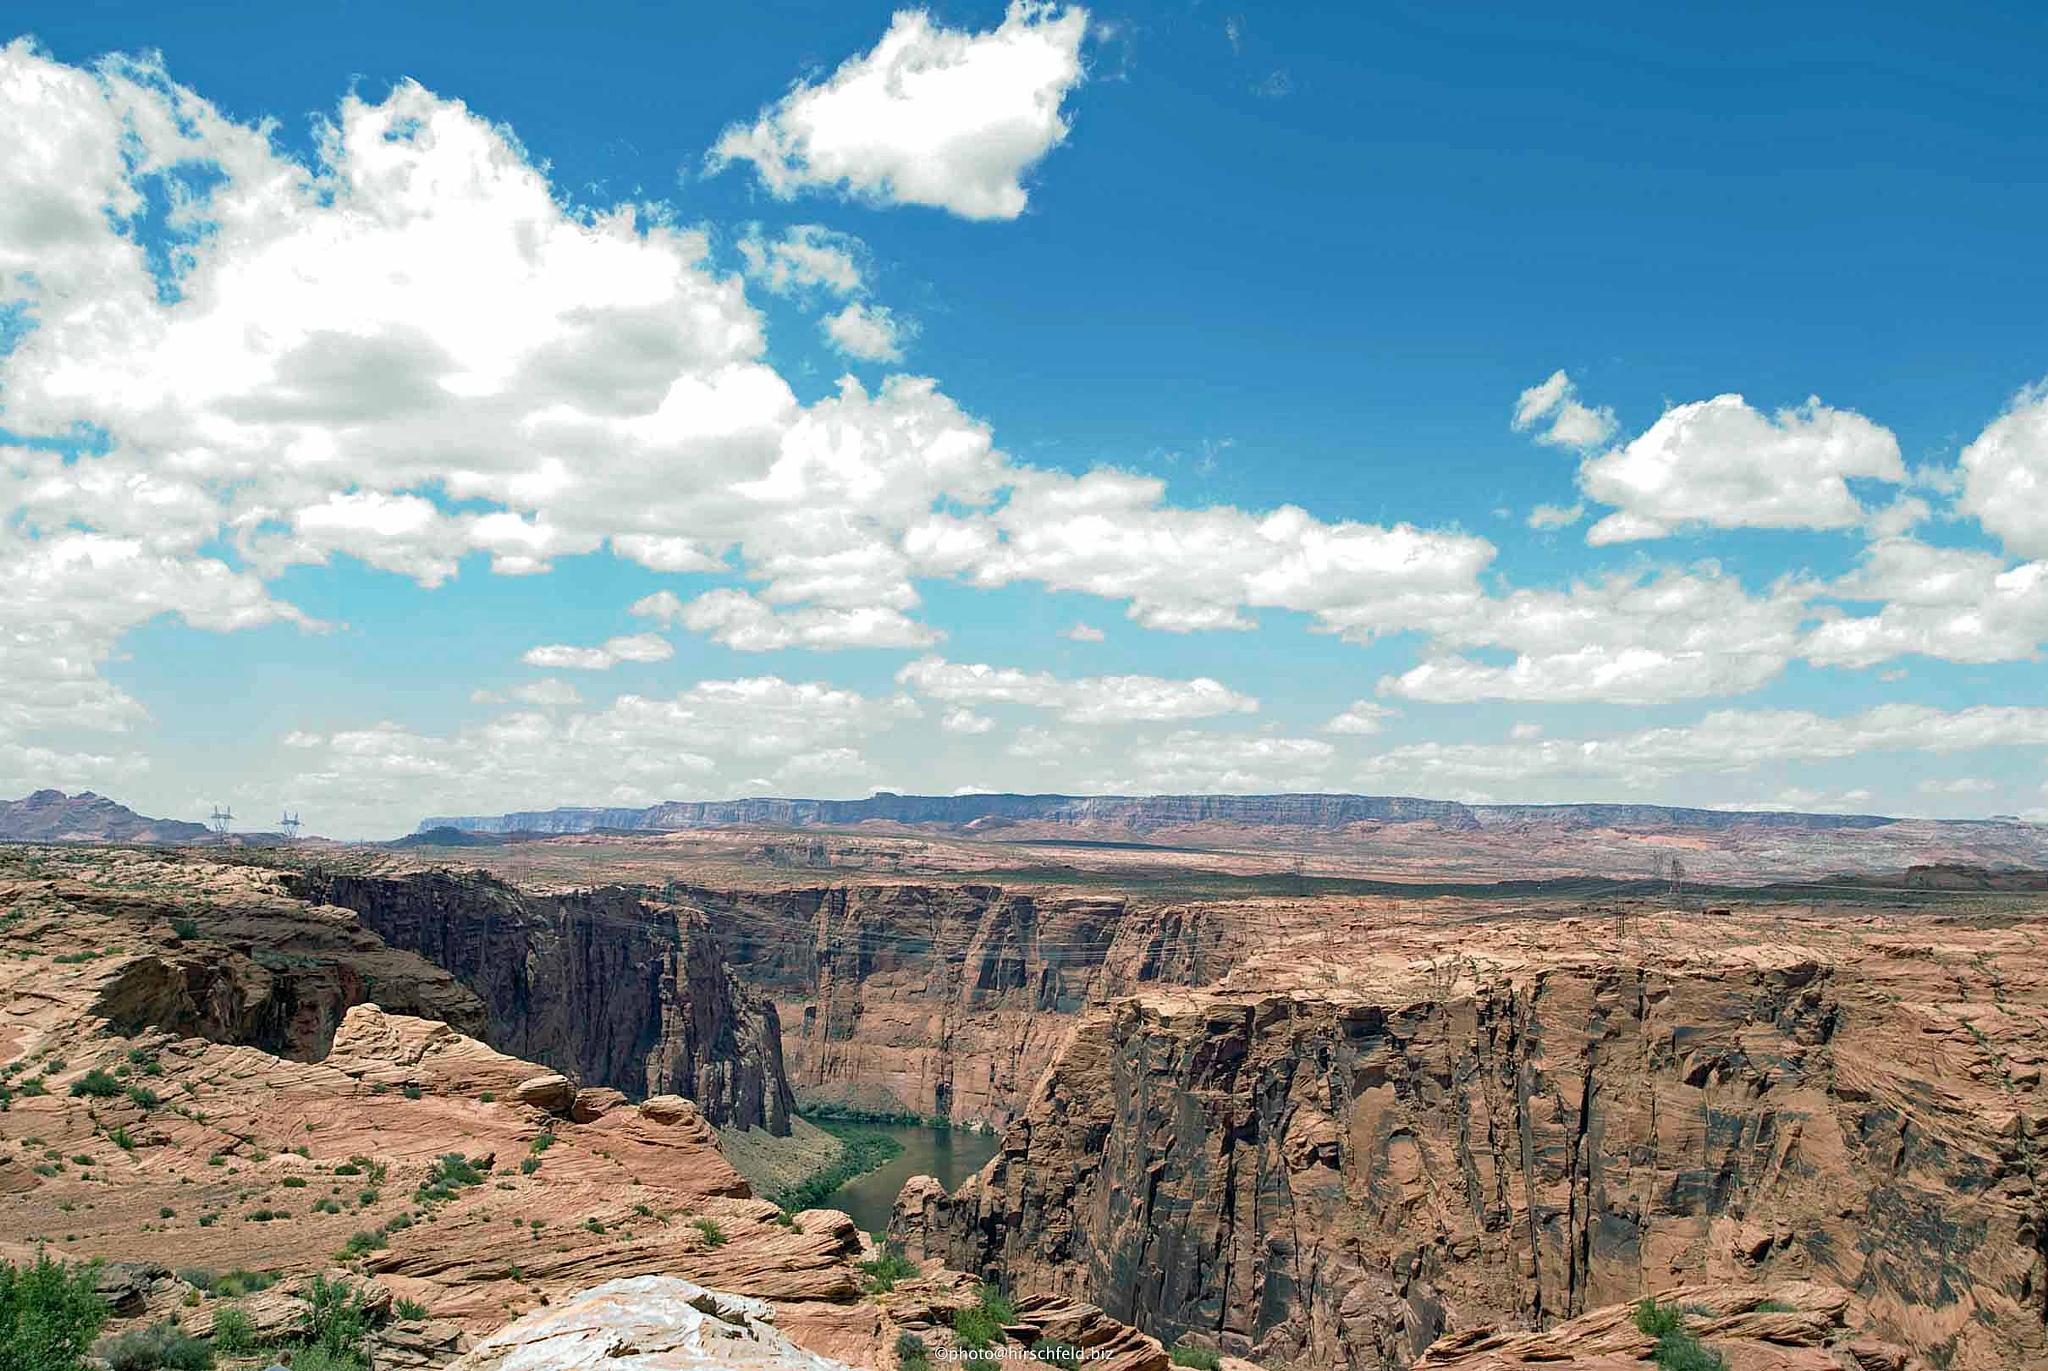 Coloradoriver, Arizona USA by edmund hirschfeld